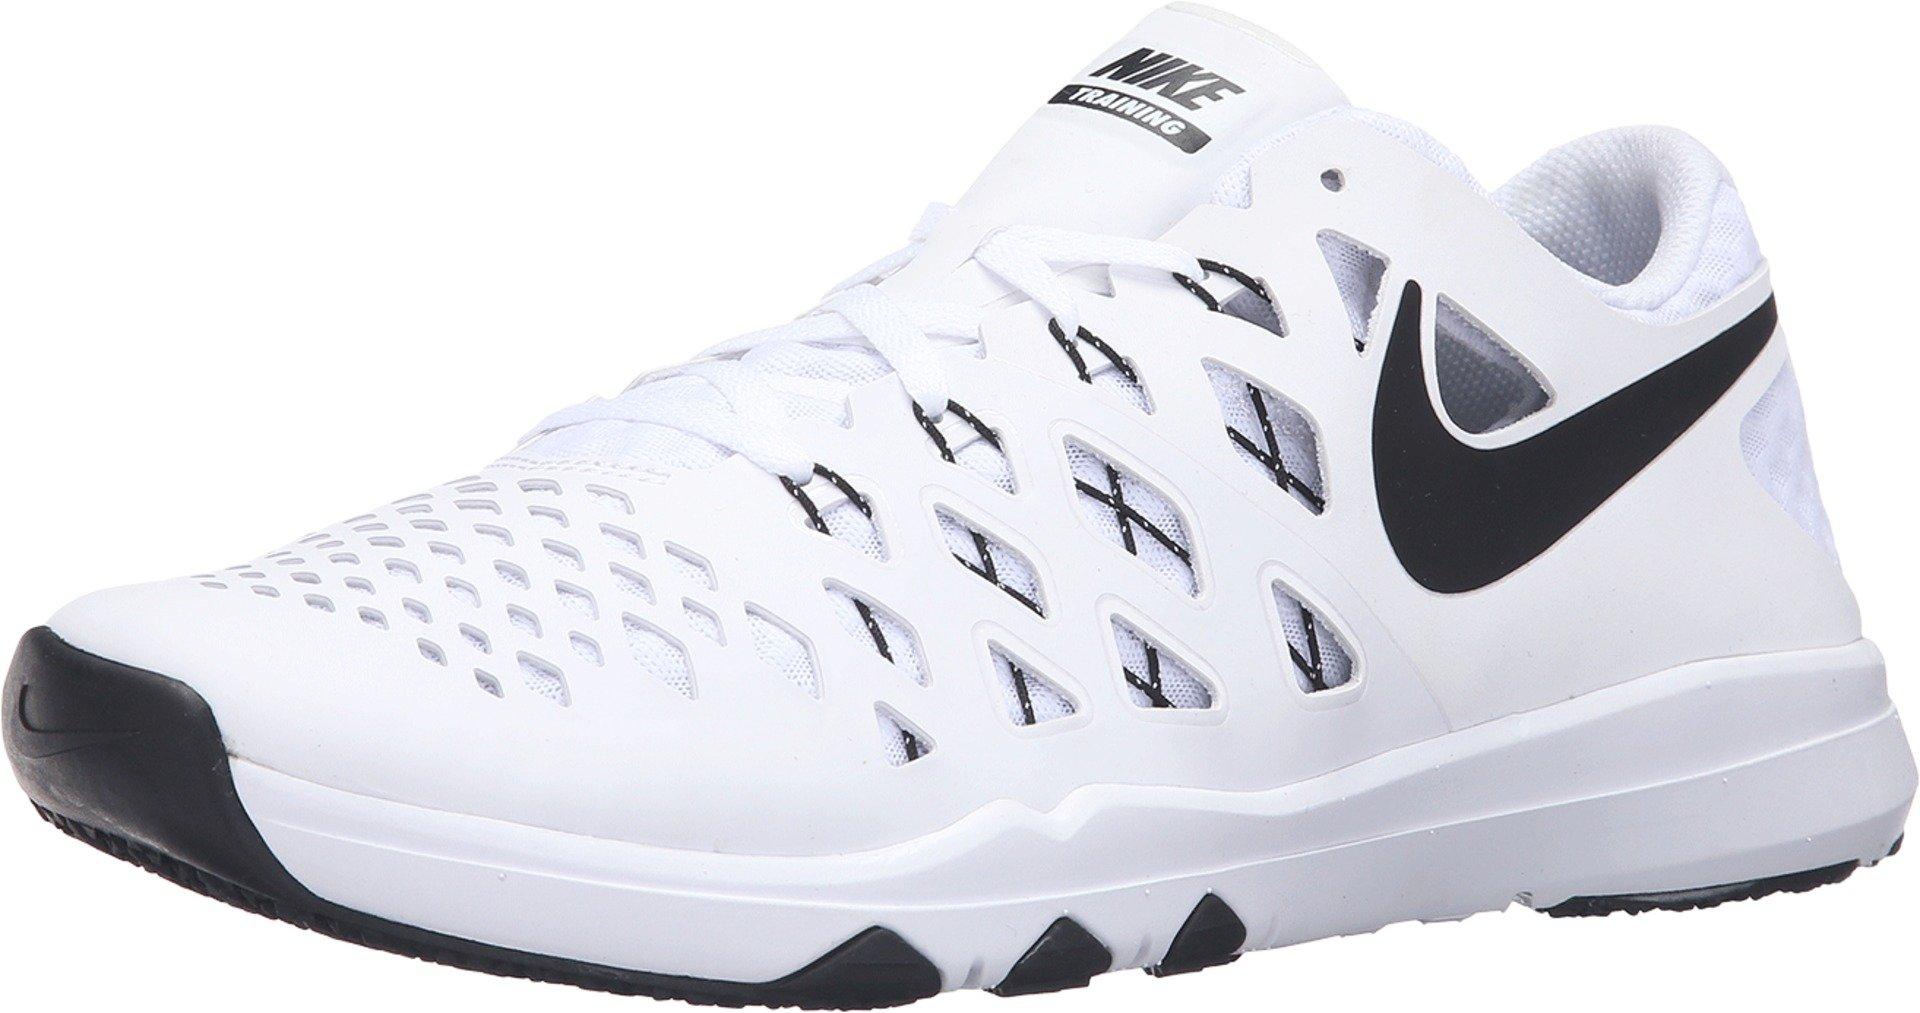 innovative design f6a1e 6eecc Galleon - NIKE Train Speed 4 White Black Men s Running Training Shoes Size  15